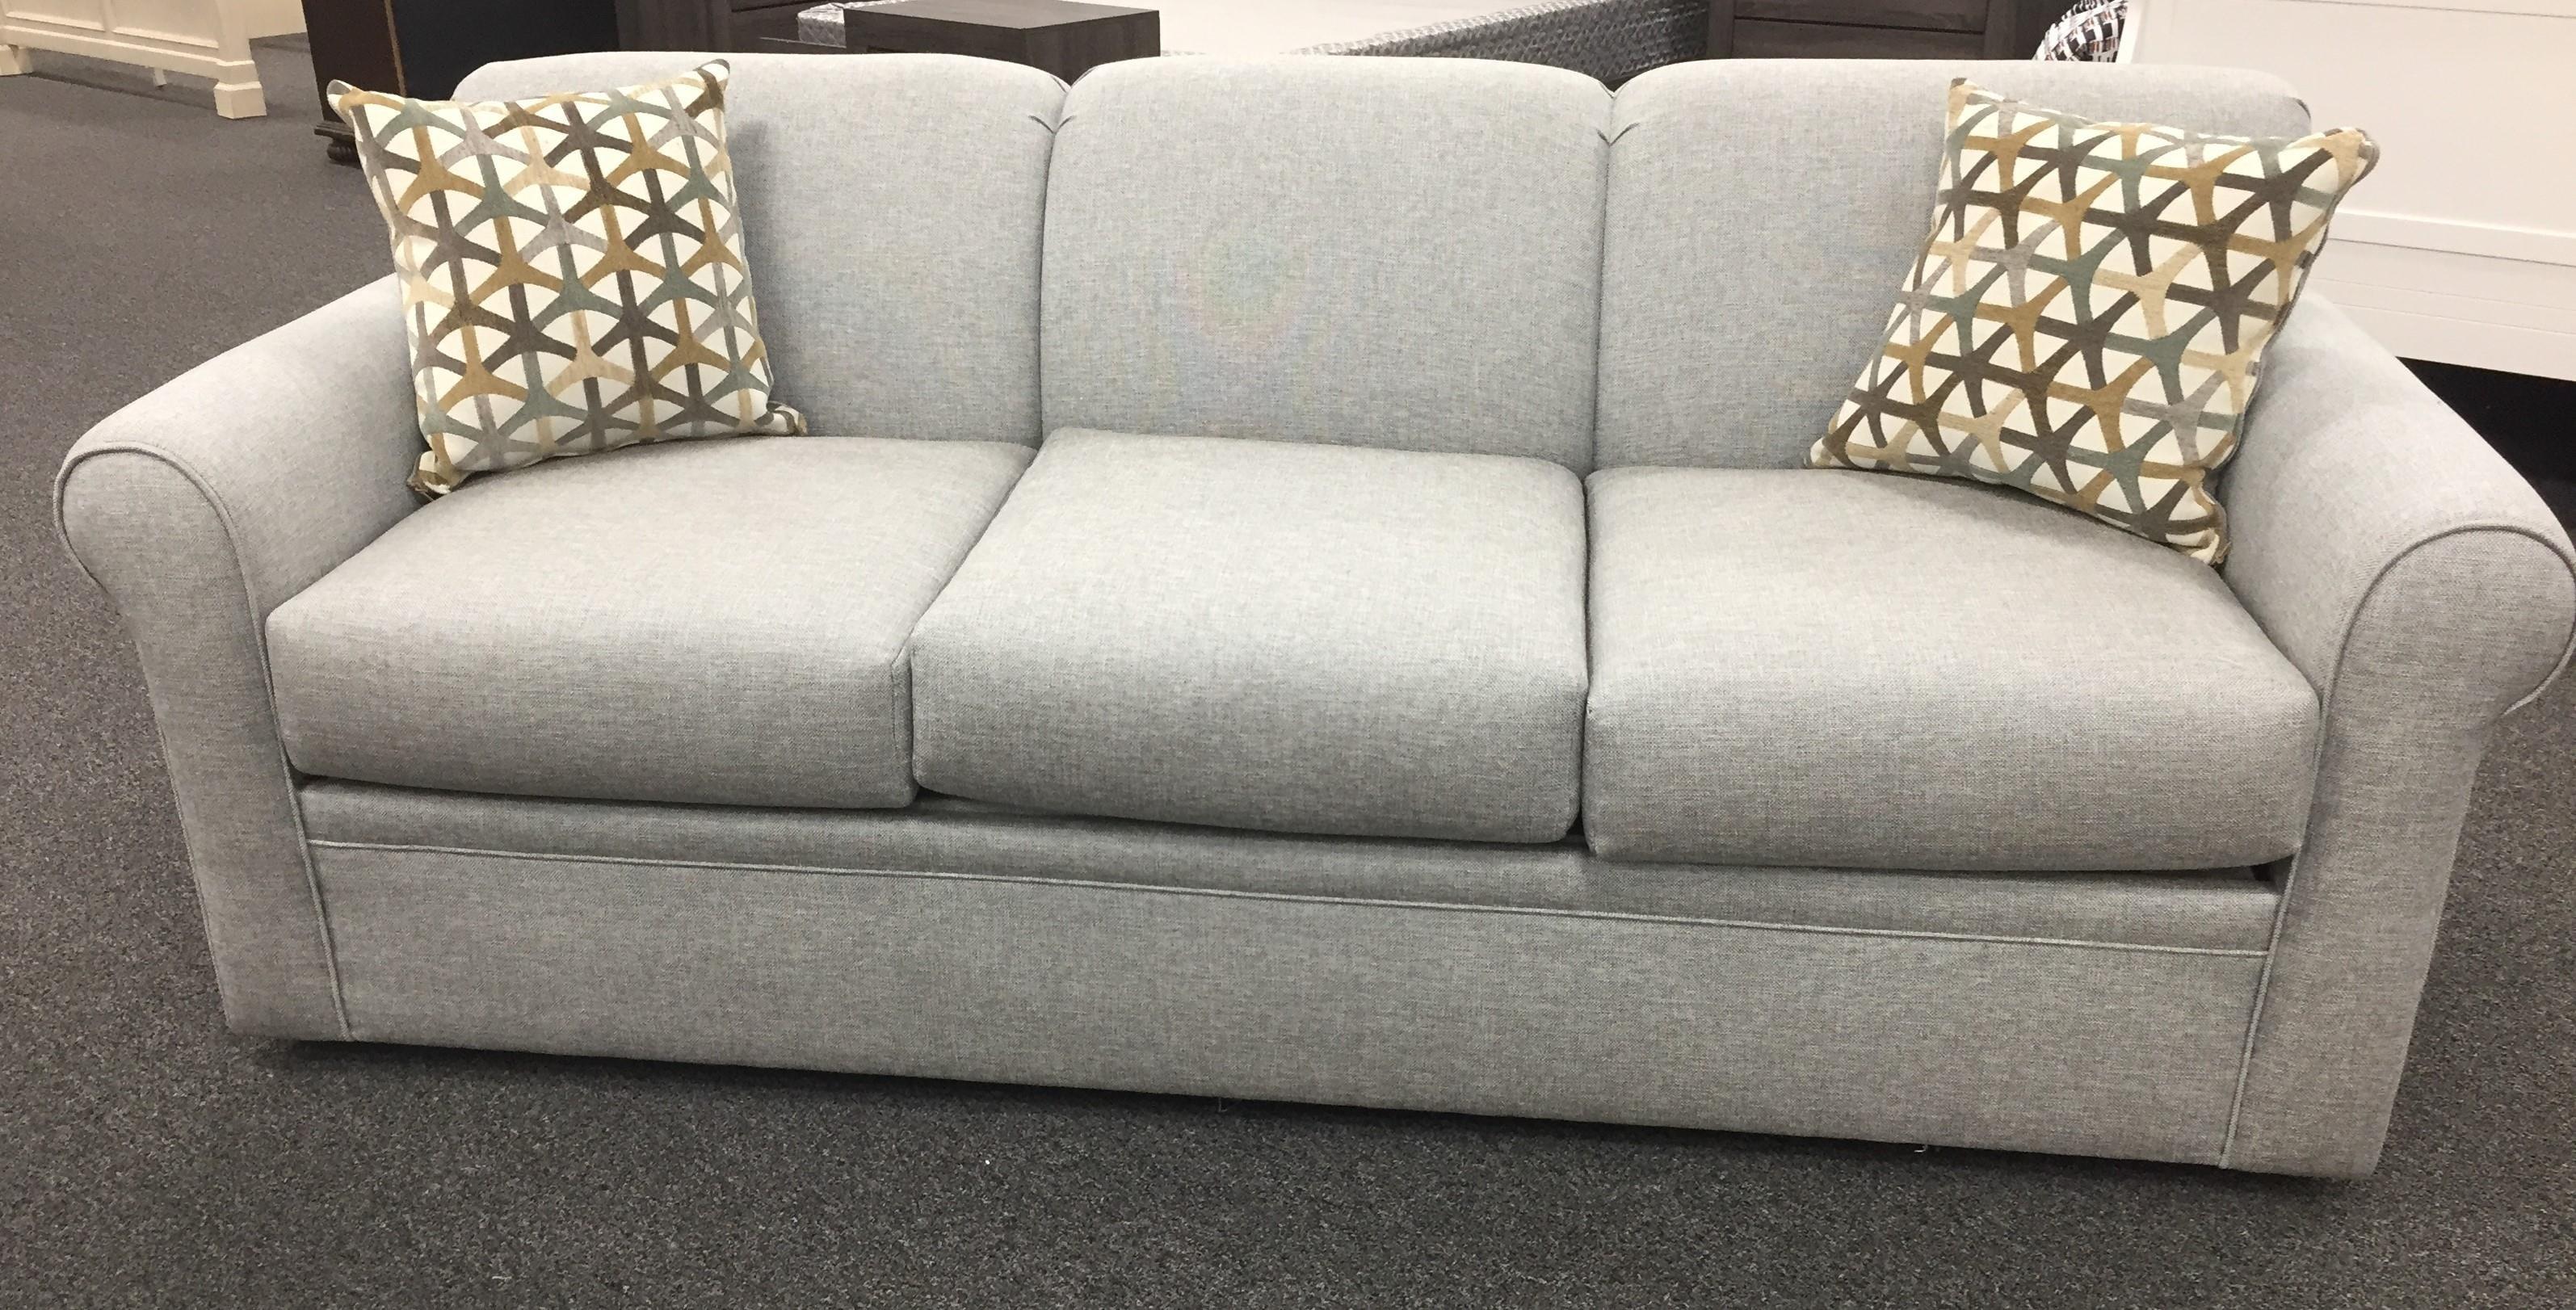 2300 Queen Sleeper Sofa by Overnight Sofa at Furniture Fair - North Carolina